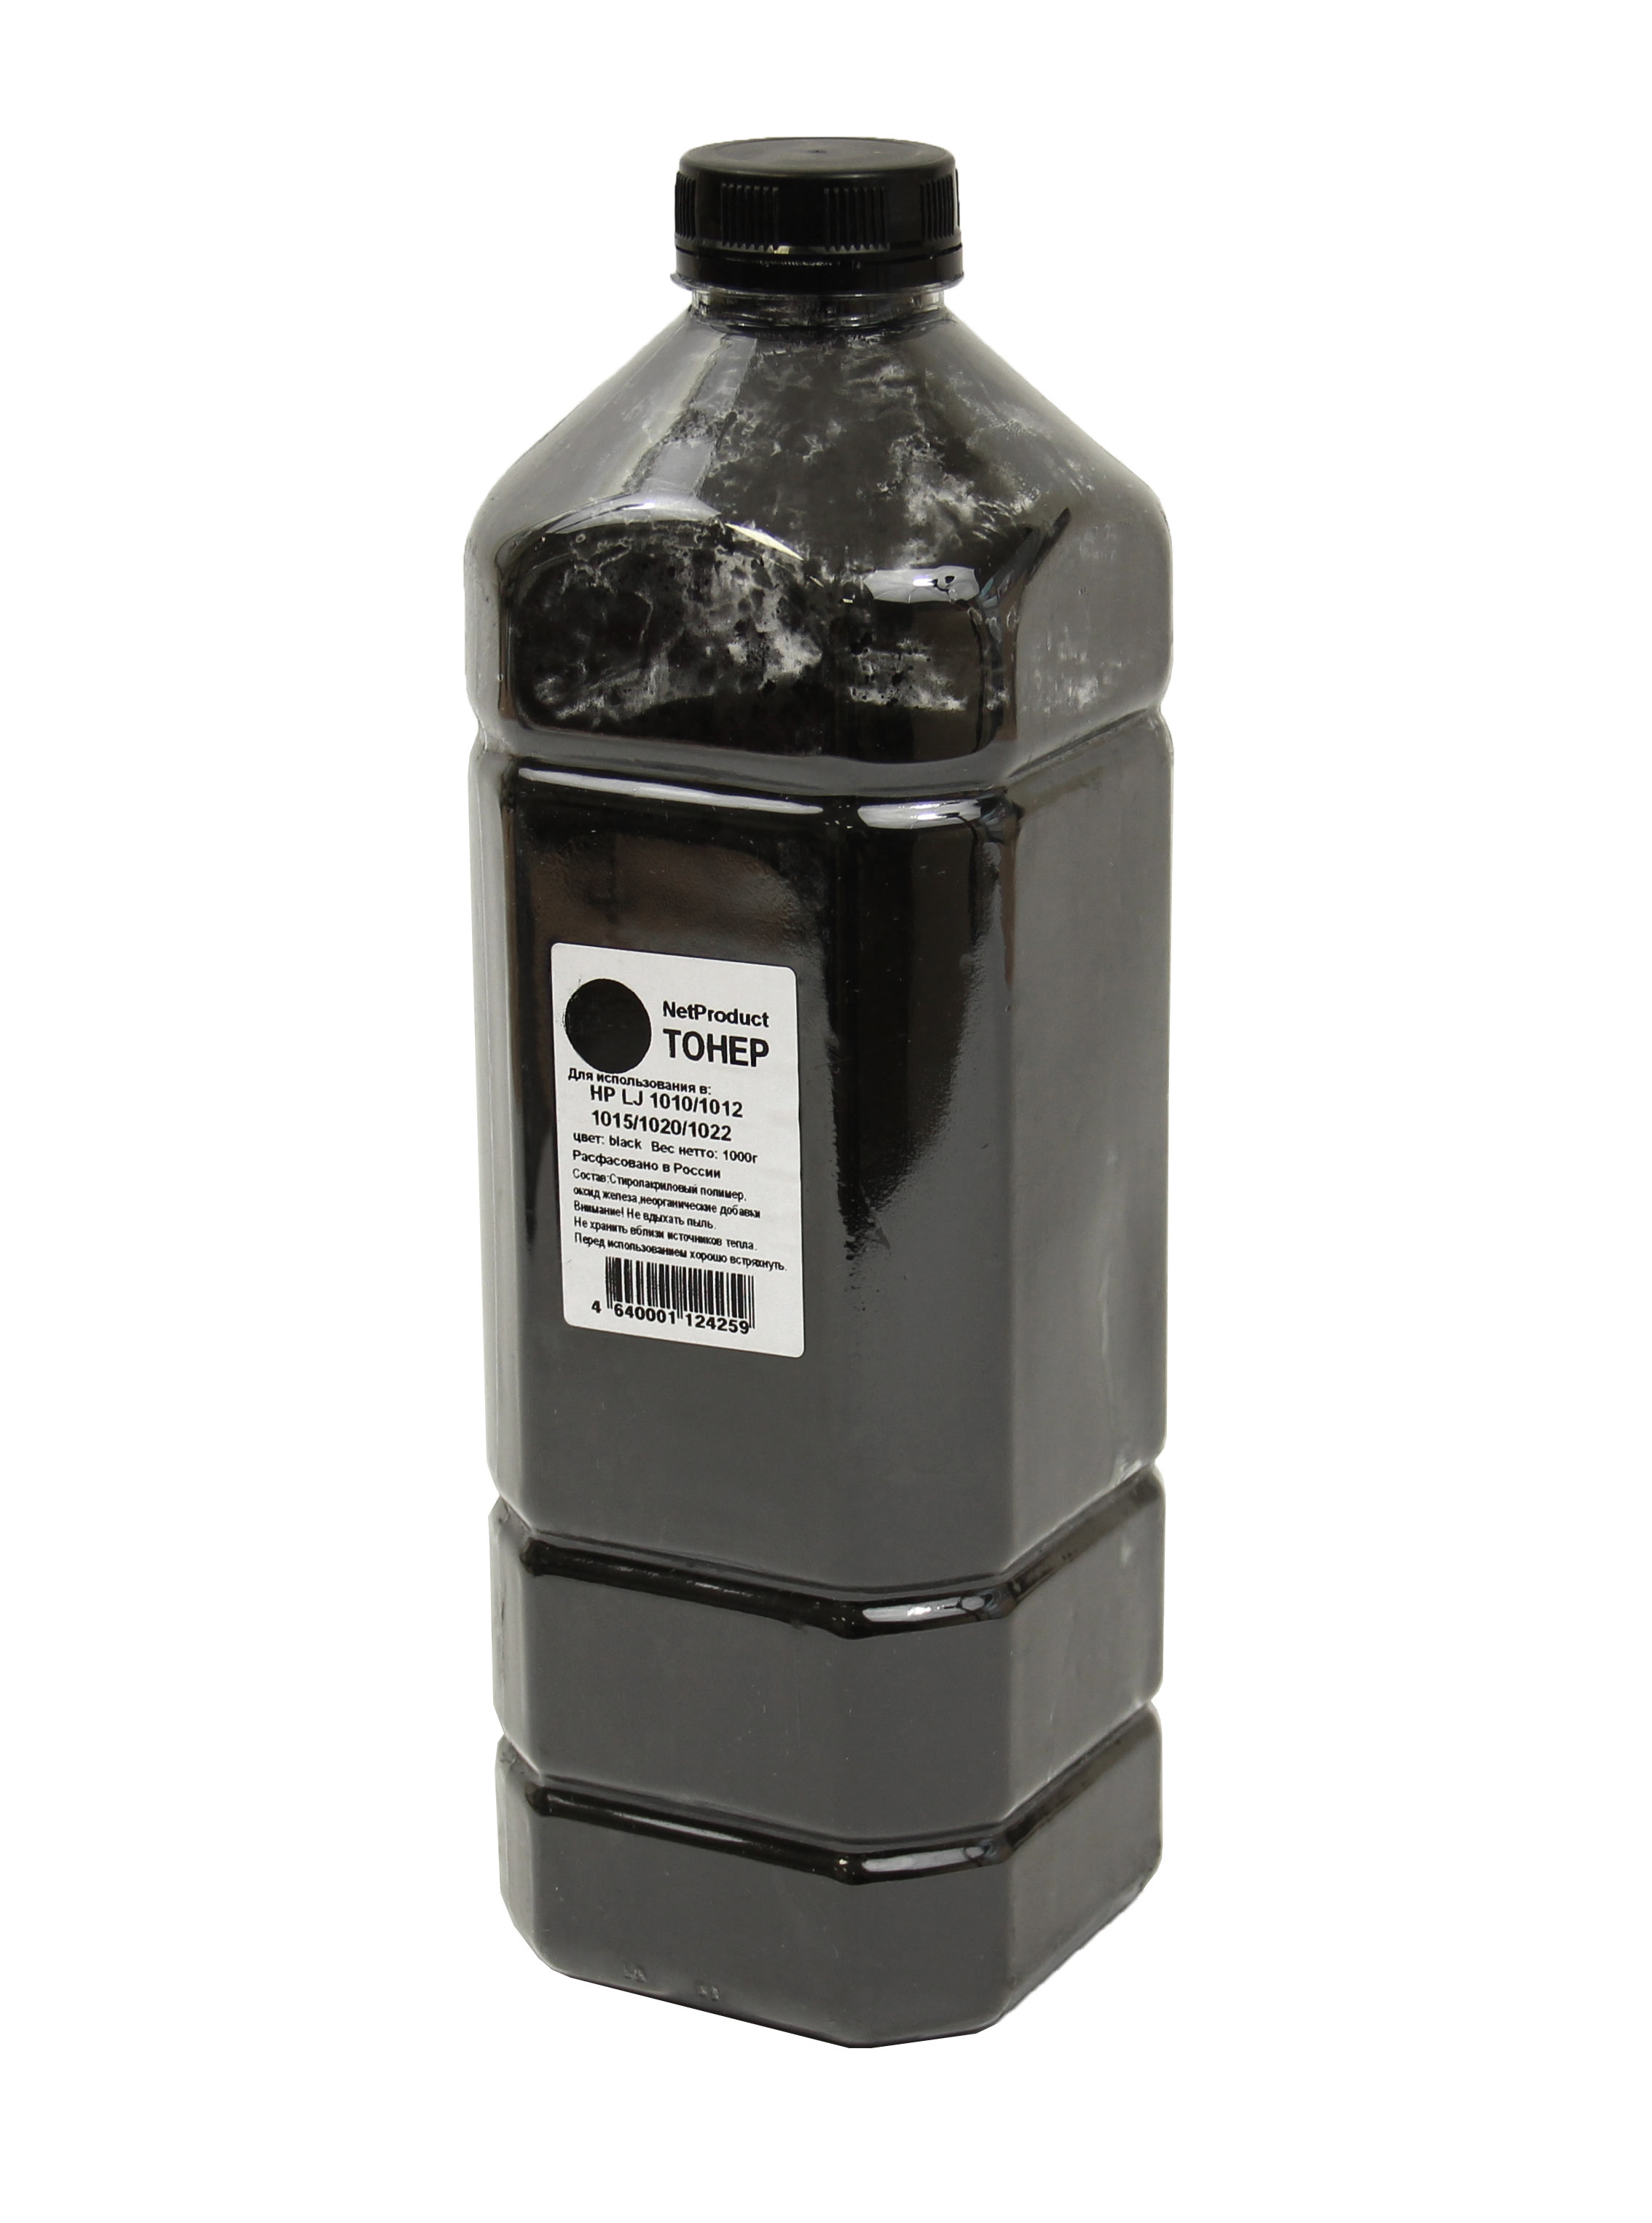 Тонер NetProduct для HP LJ 1010/1012/1015/1020/1022, Bk, 1 кг, канистра